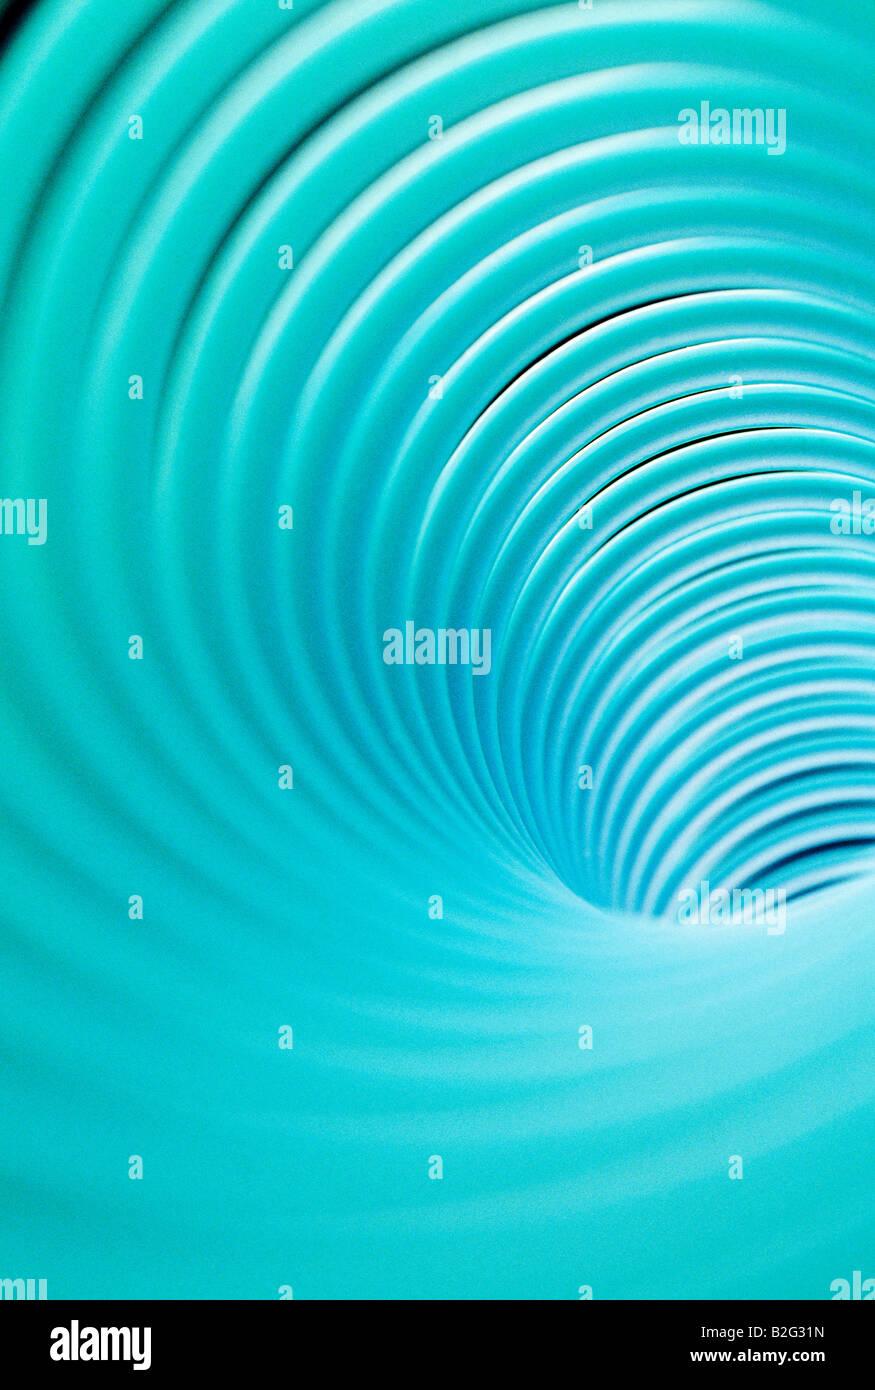 Resumen vista de cerca de un 'Slinky' toy Imagen De Stock